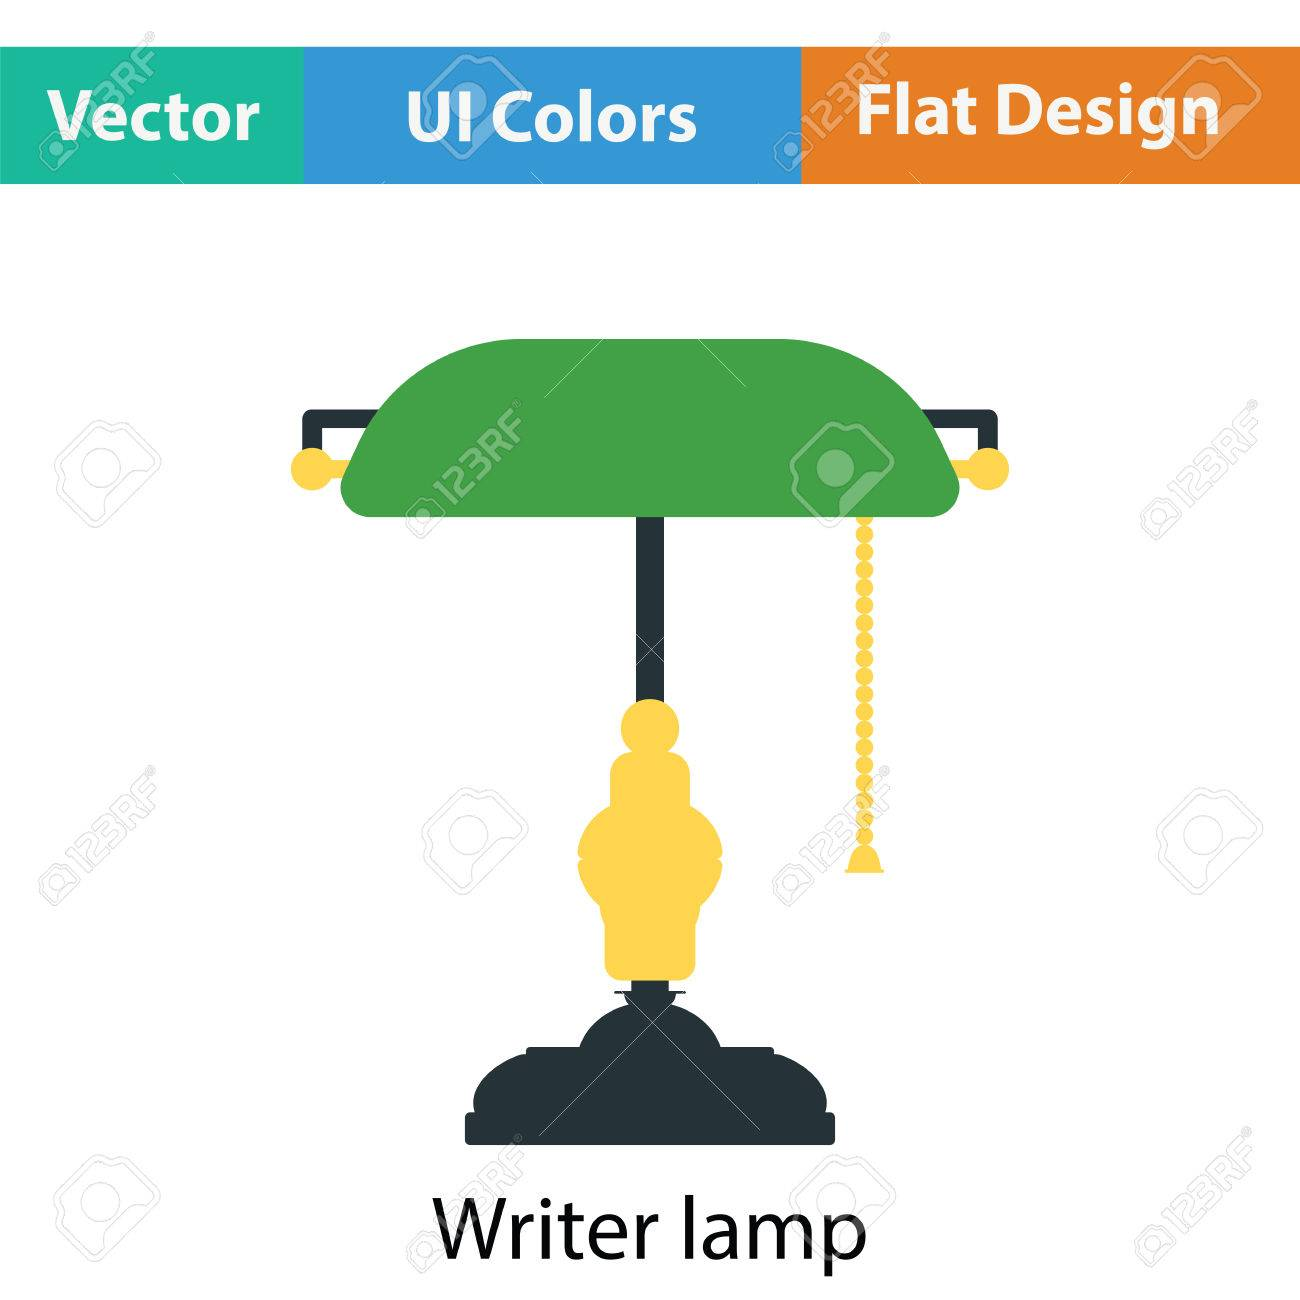 Flat design lampe